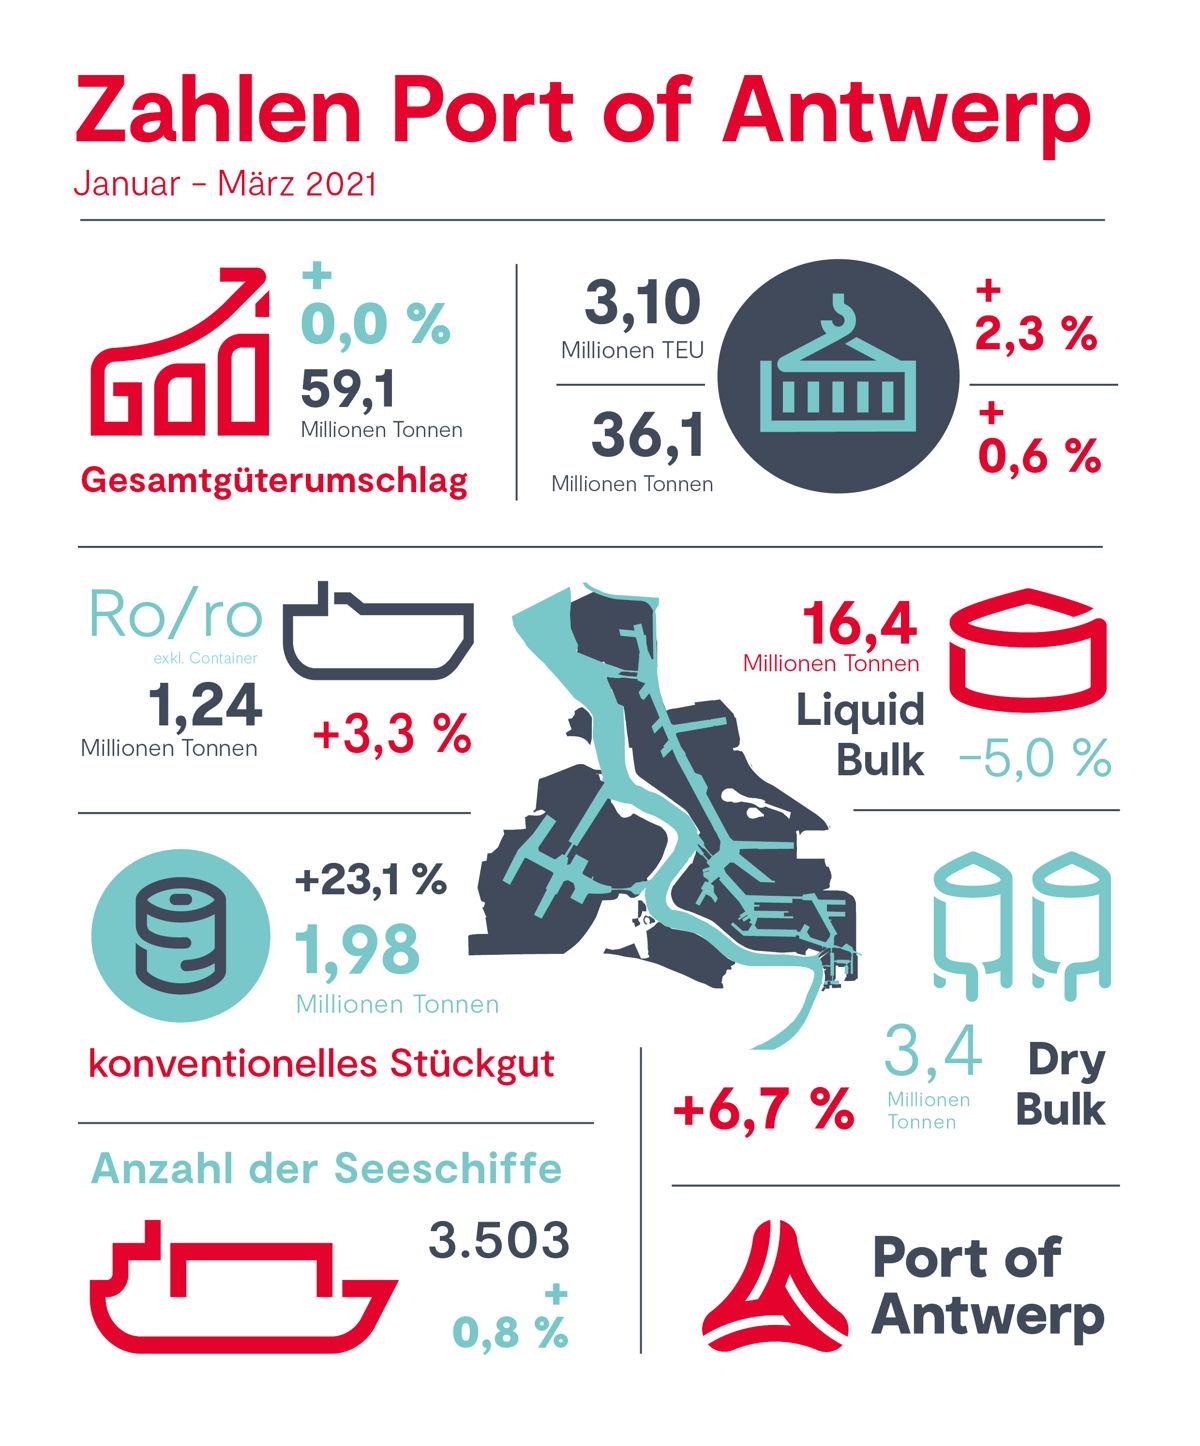 Zahlen Port of Antwerp Q1 2021